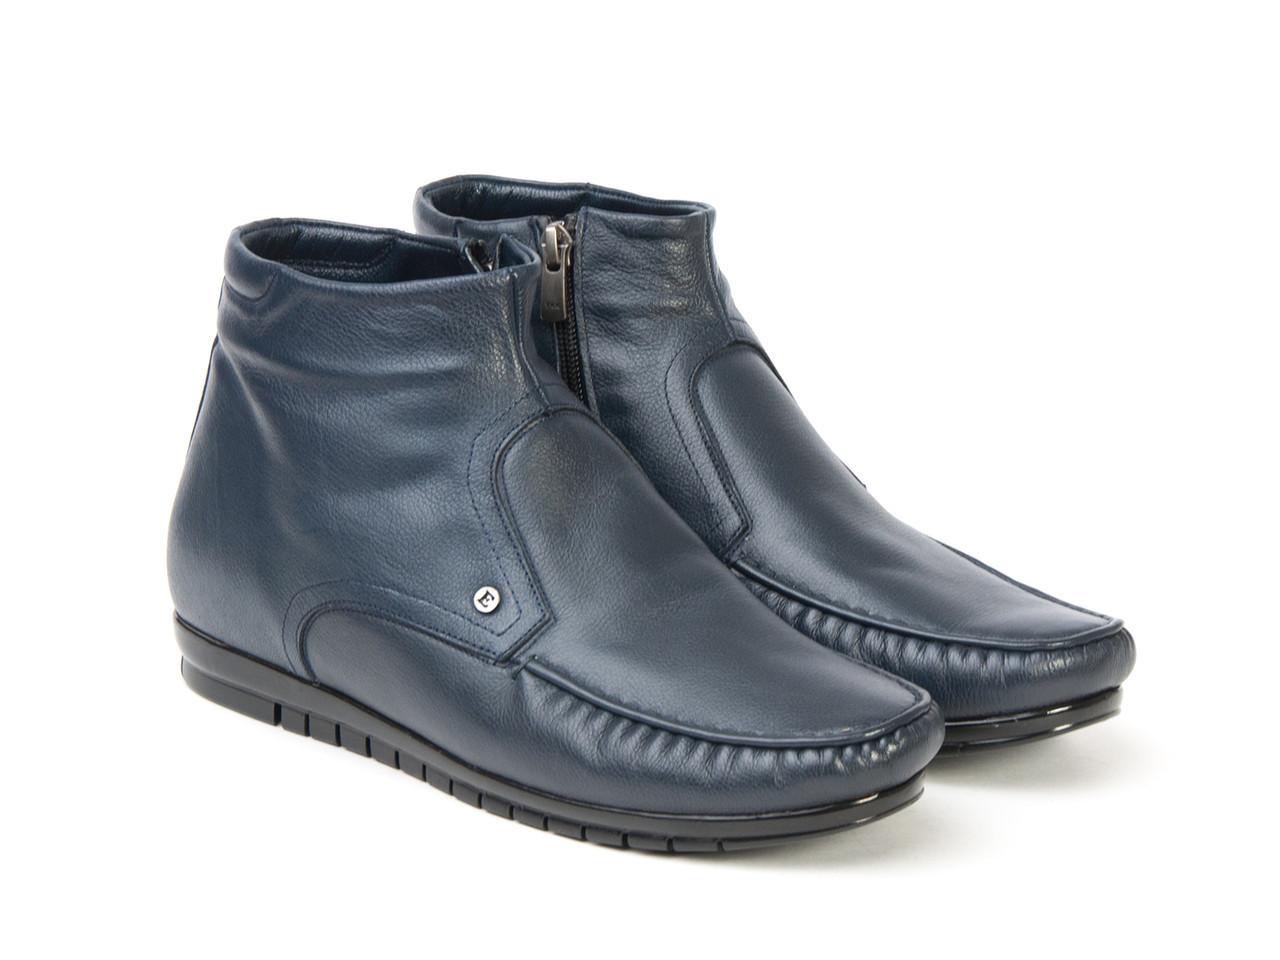 Ботинки Etor 12490-8731-245 41 синие